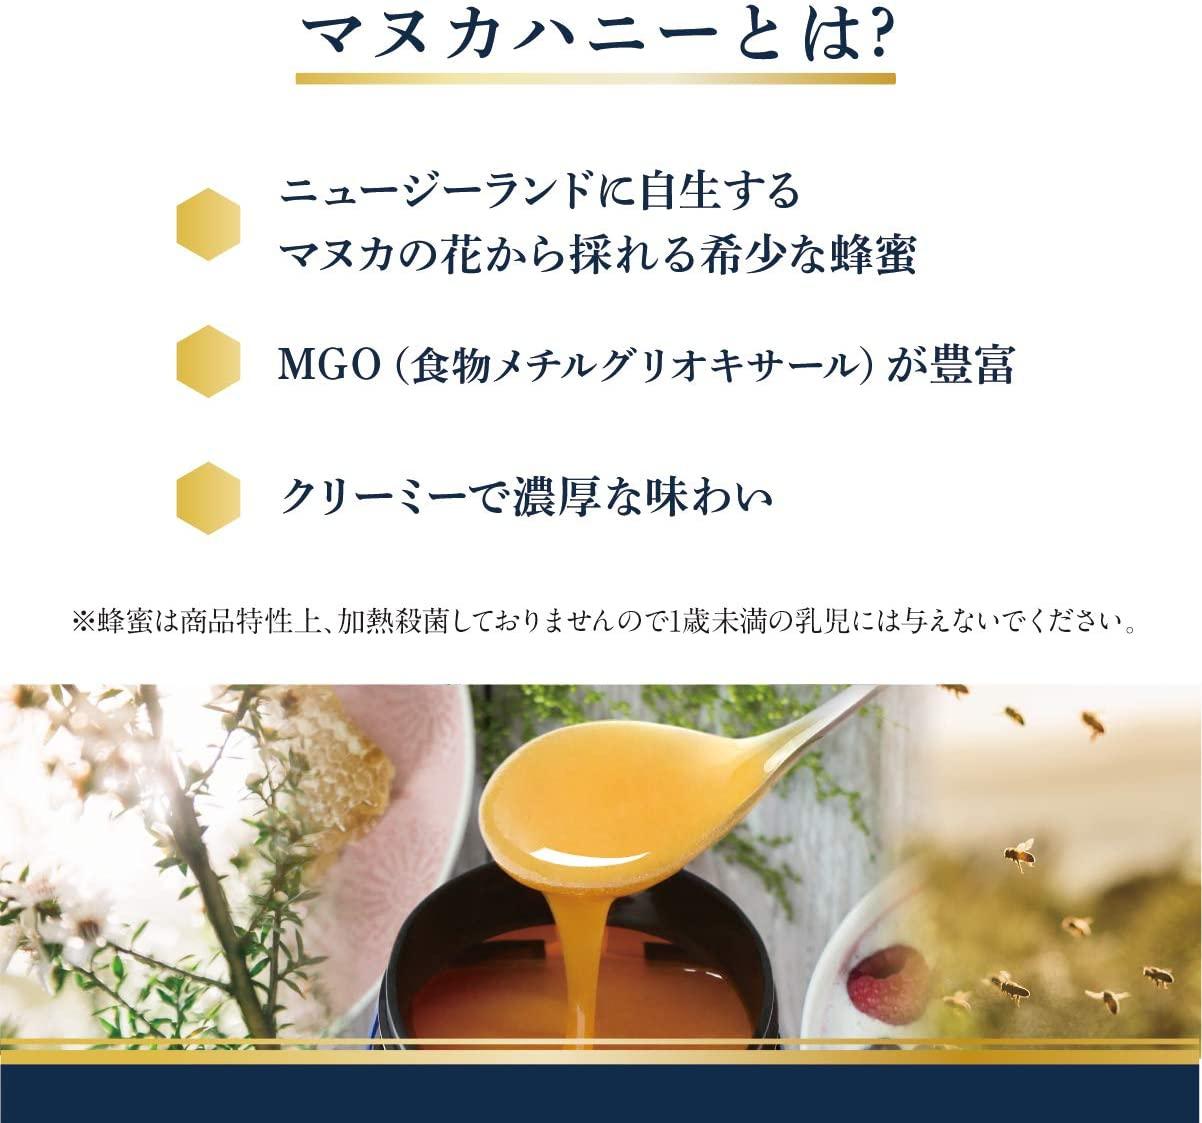 Manuka Health(マヌカへルス) MGO 400+ Manuka Honeyの商品画像8